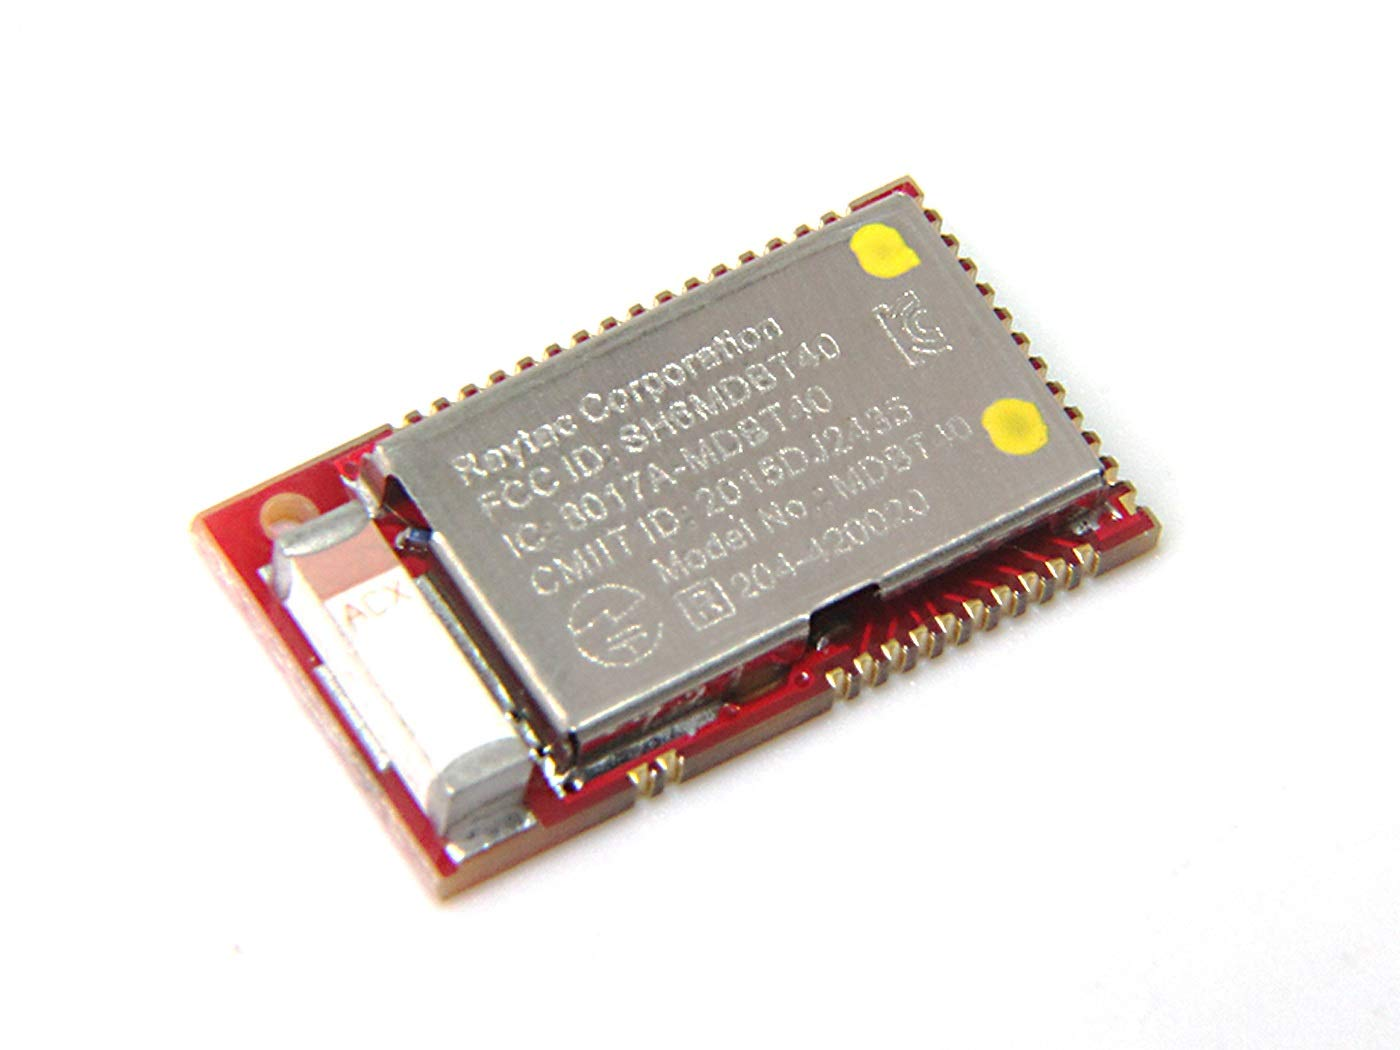 NGW-1pc MDBT40-256RV3 nRF51822 based BLE module: Amazon co uk